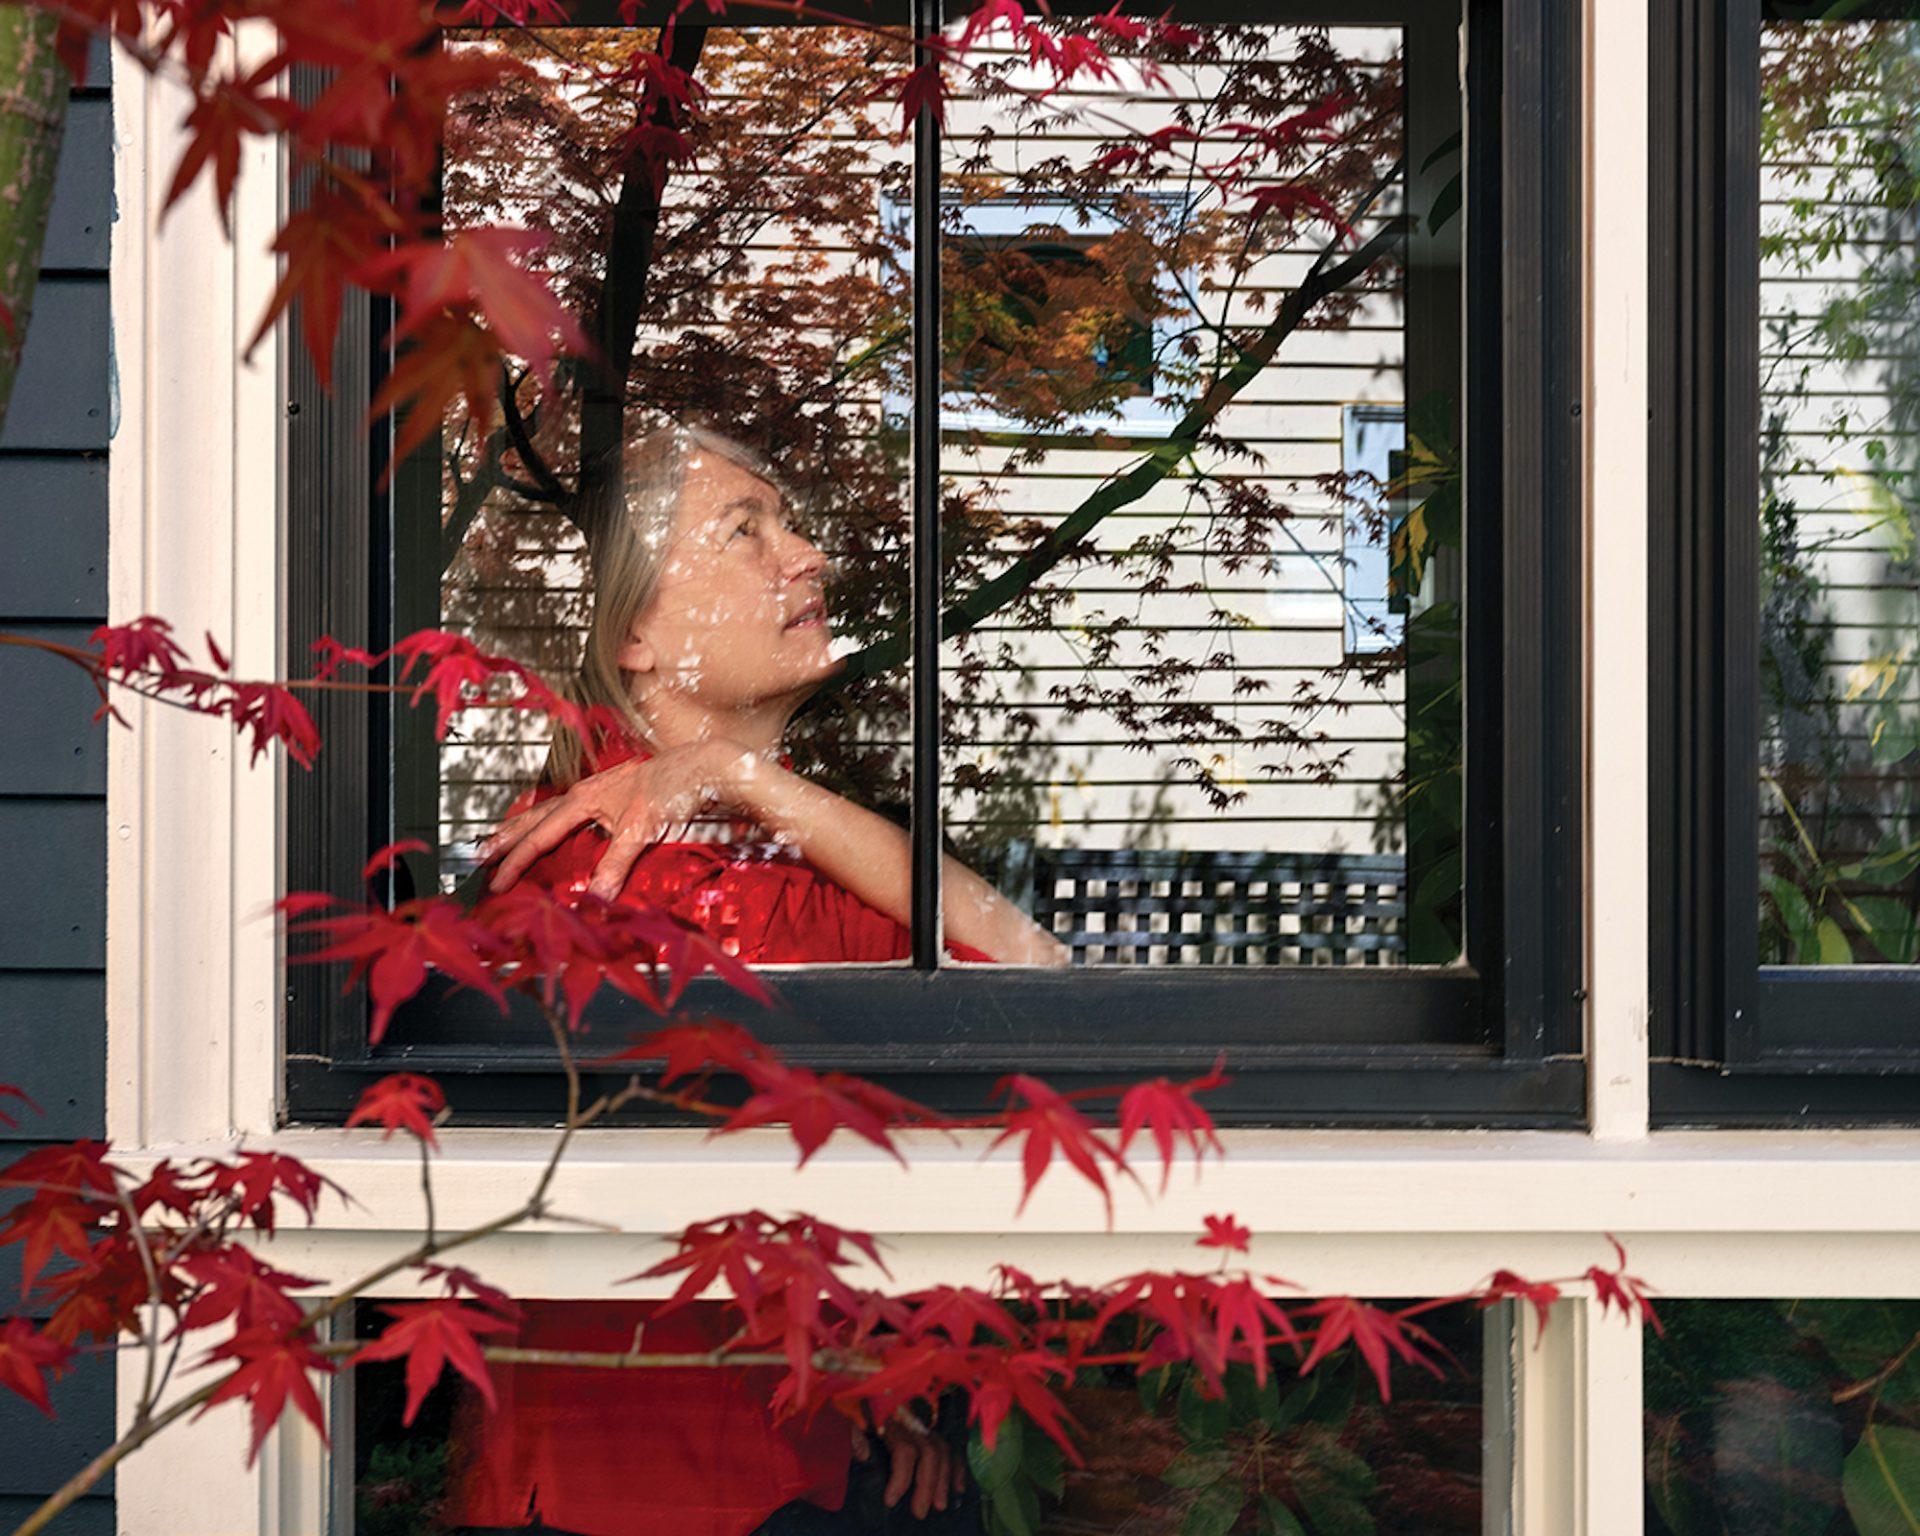 Across Windows : la photographe Rania Matar adapte ses portraits à la pandémie